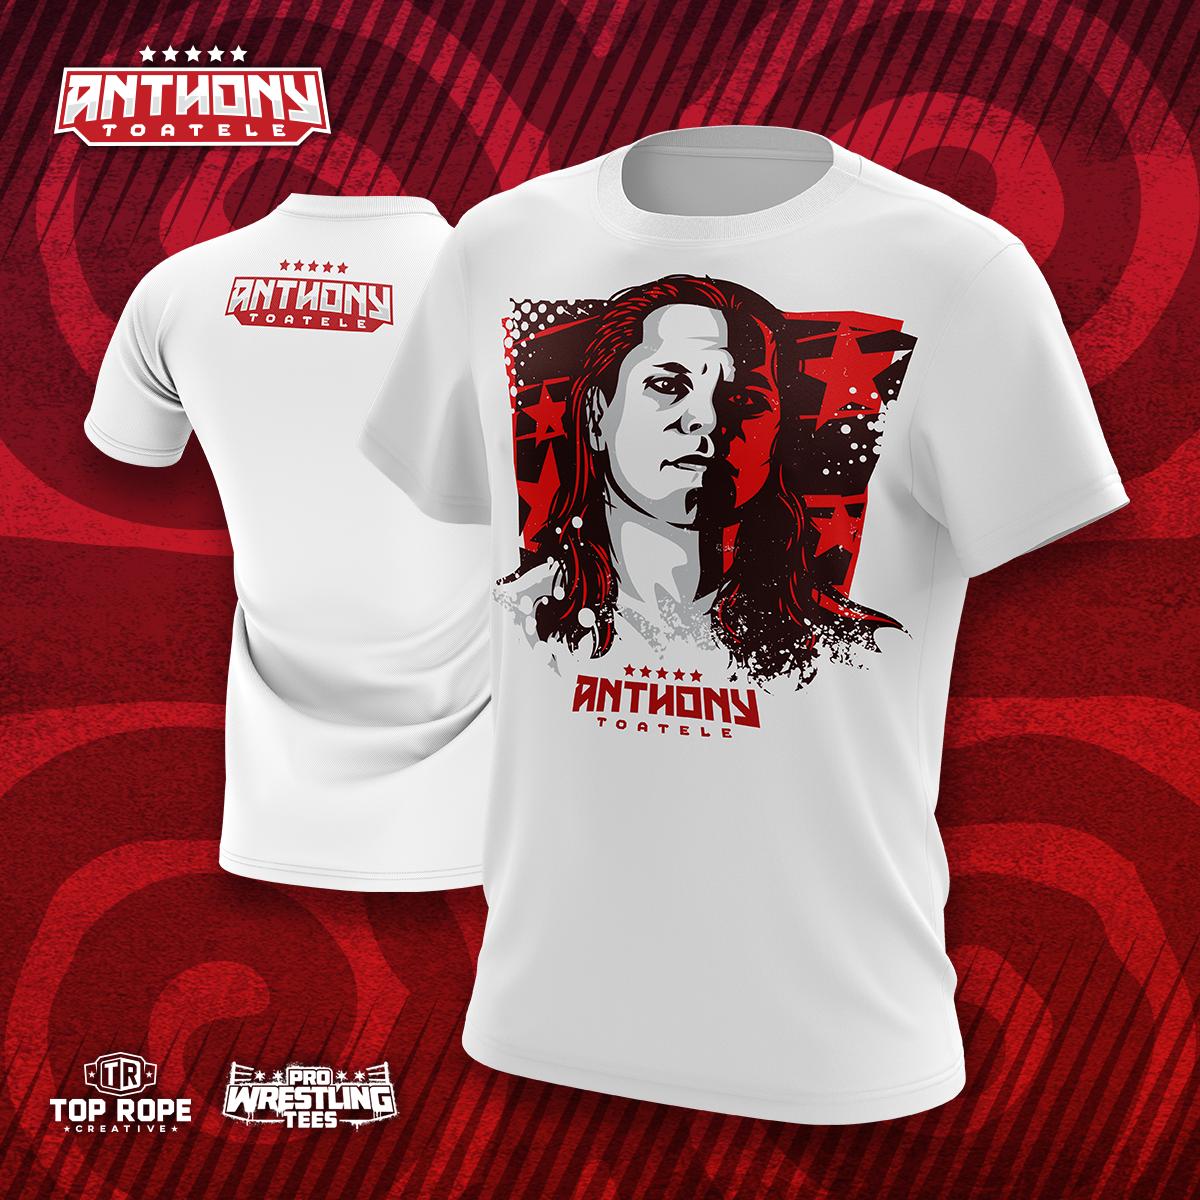 shirt-promo-2.png